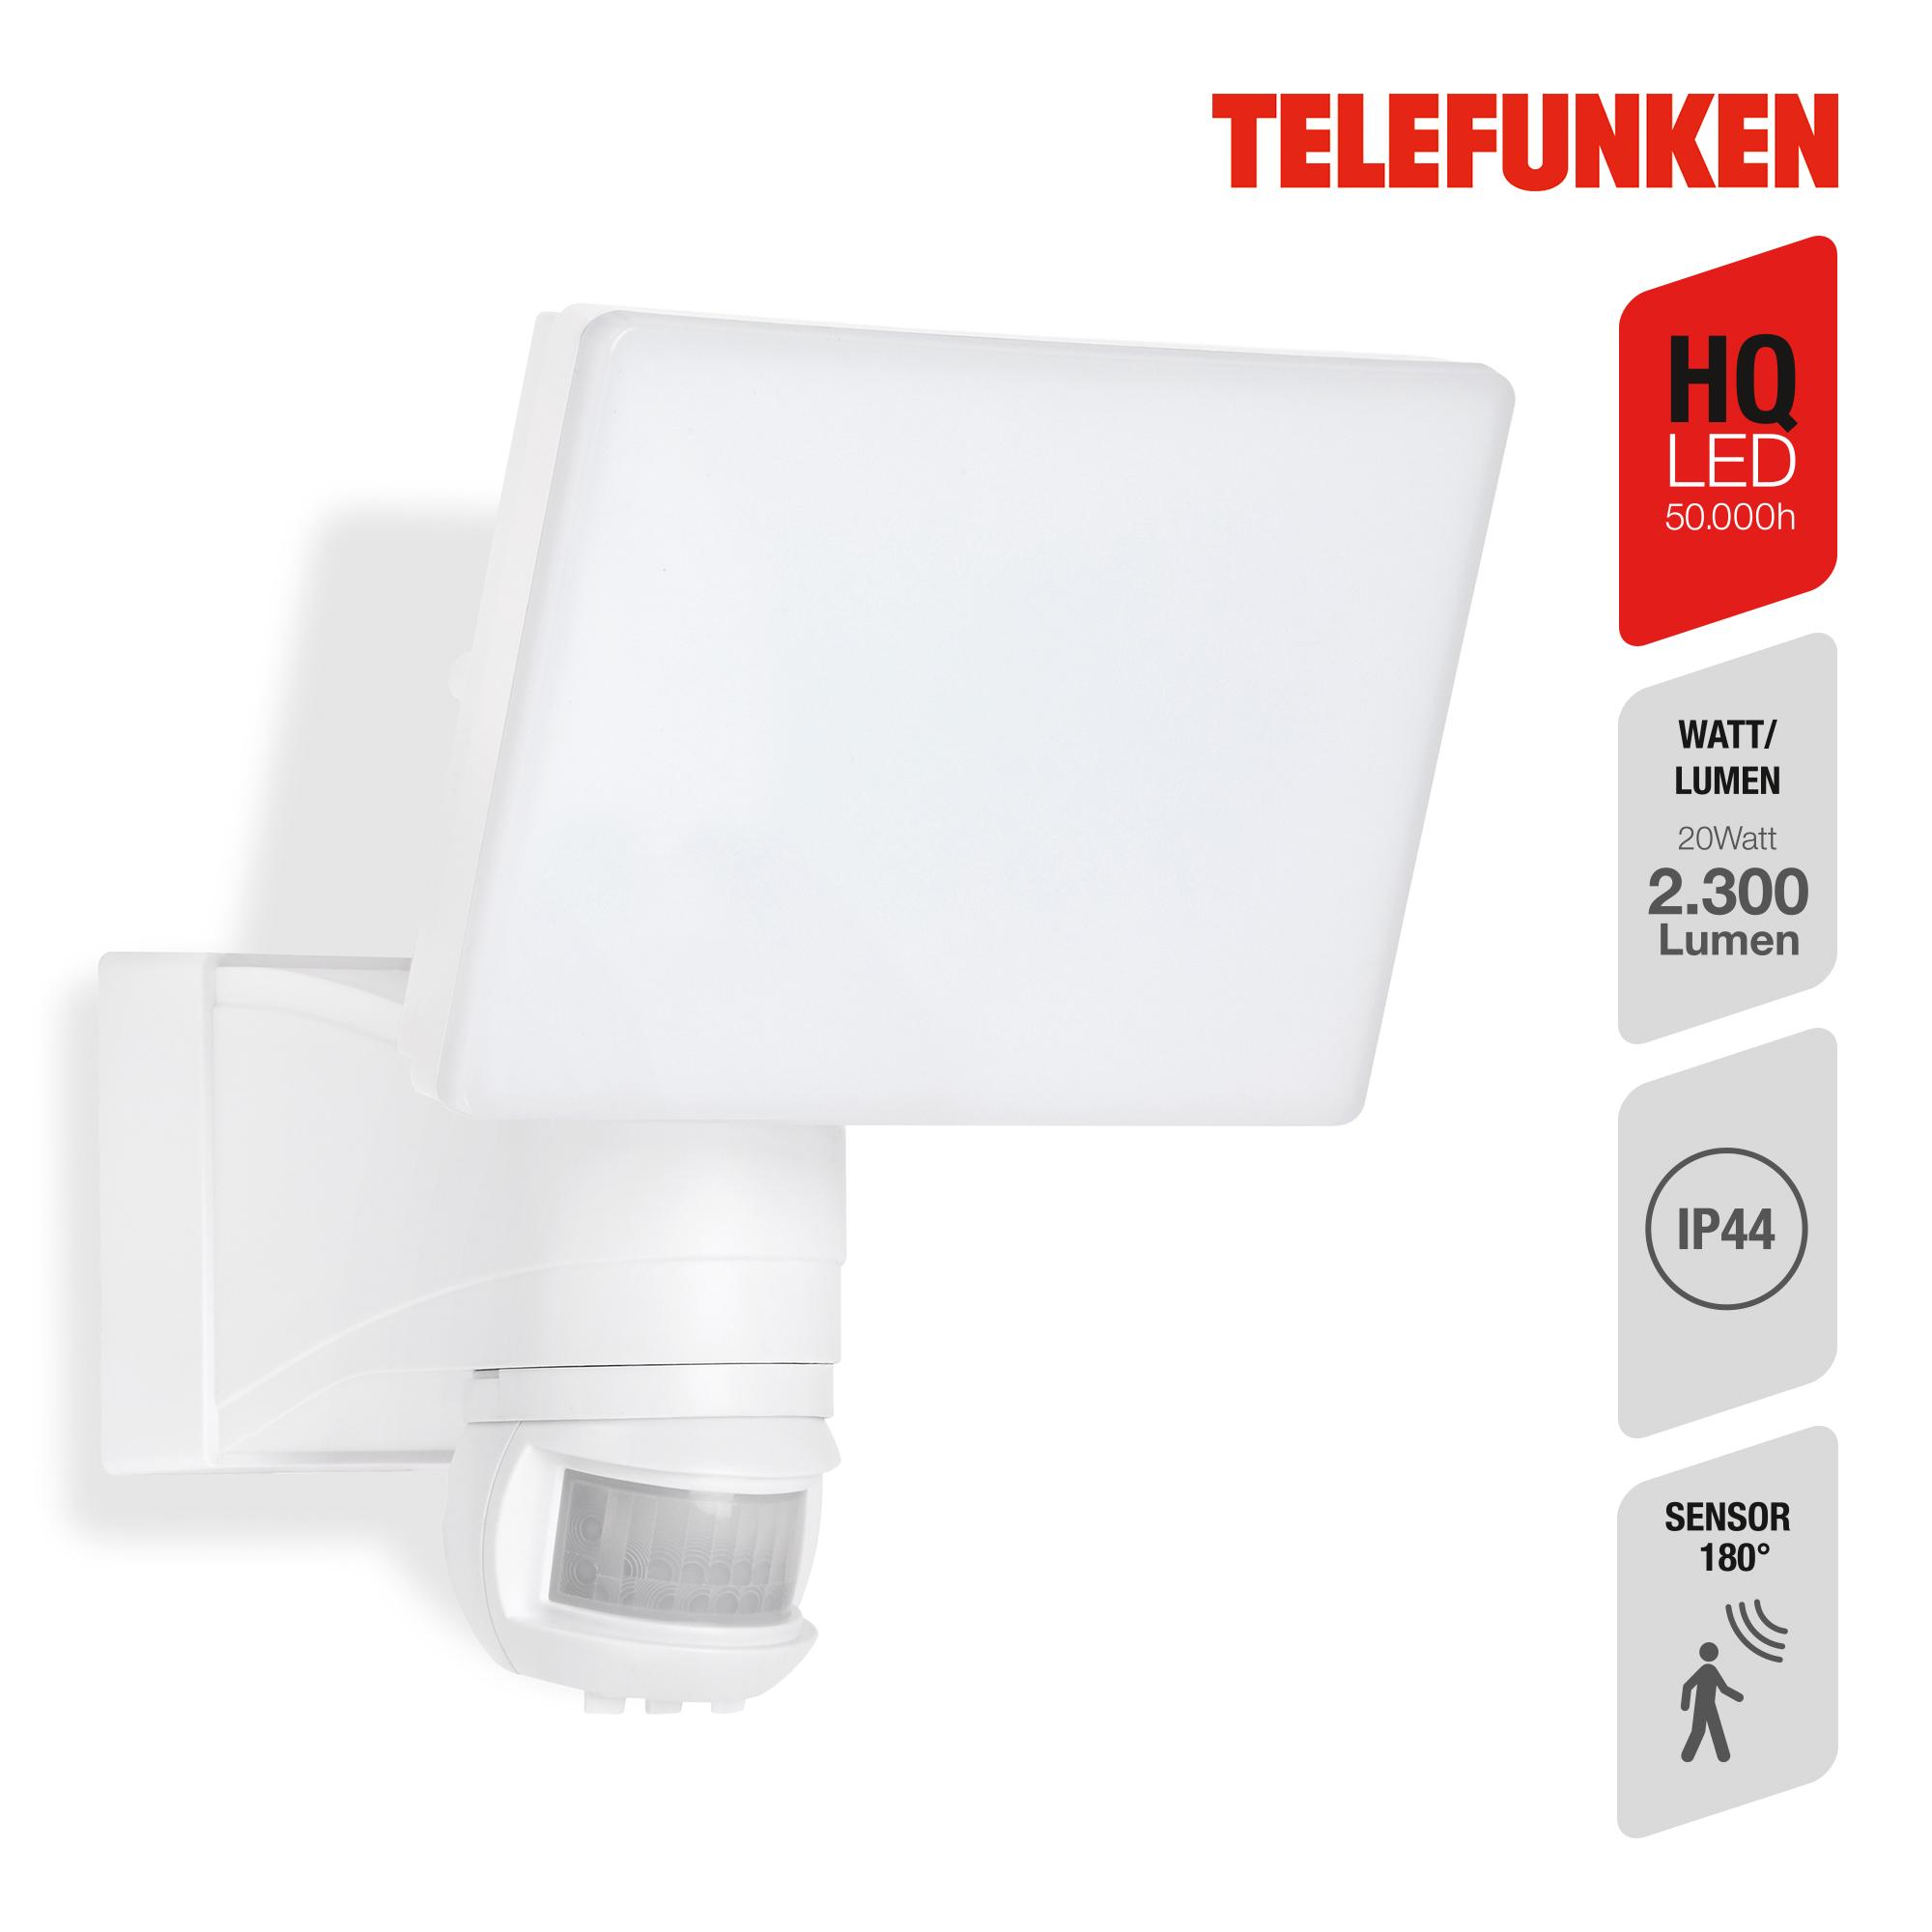 TELEFUNKEN LED Sensor Außenstrahler Weiß